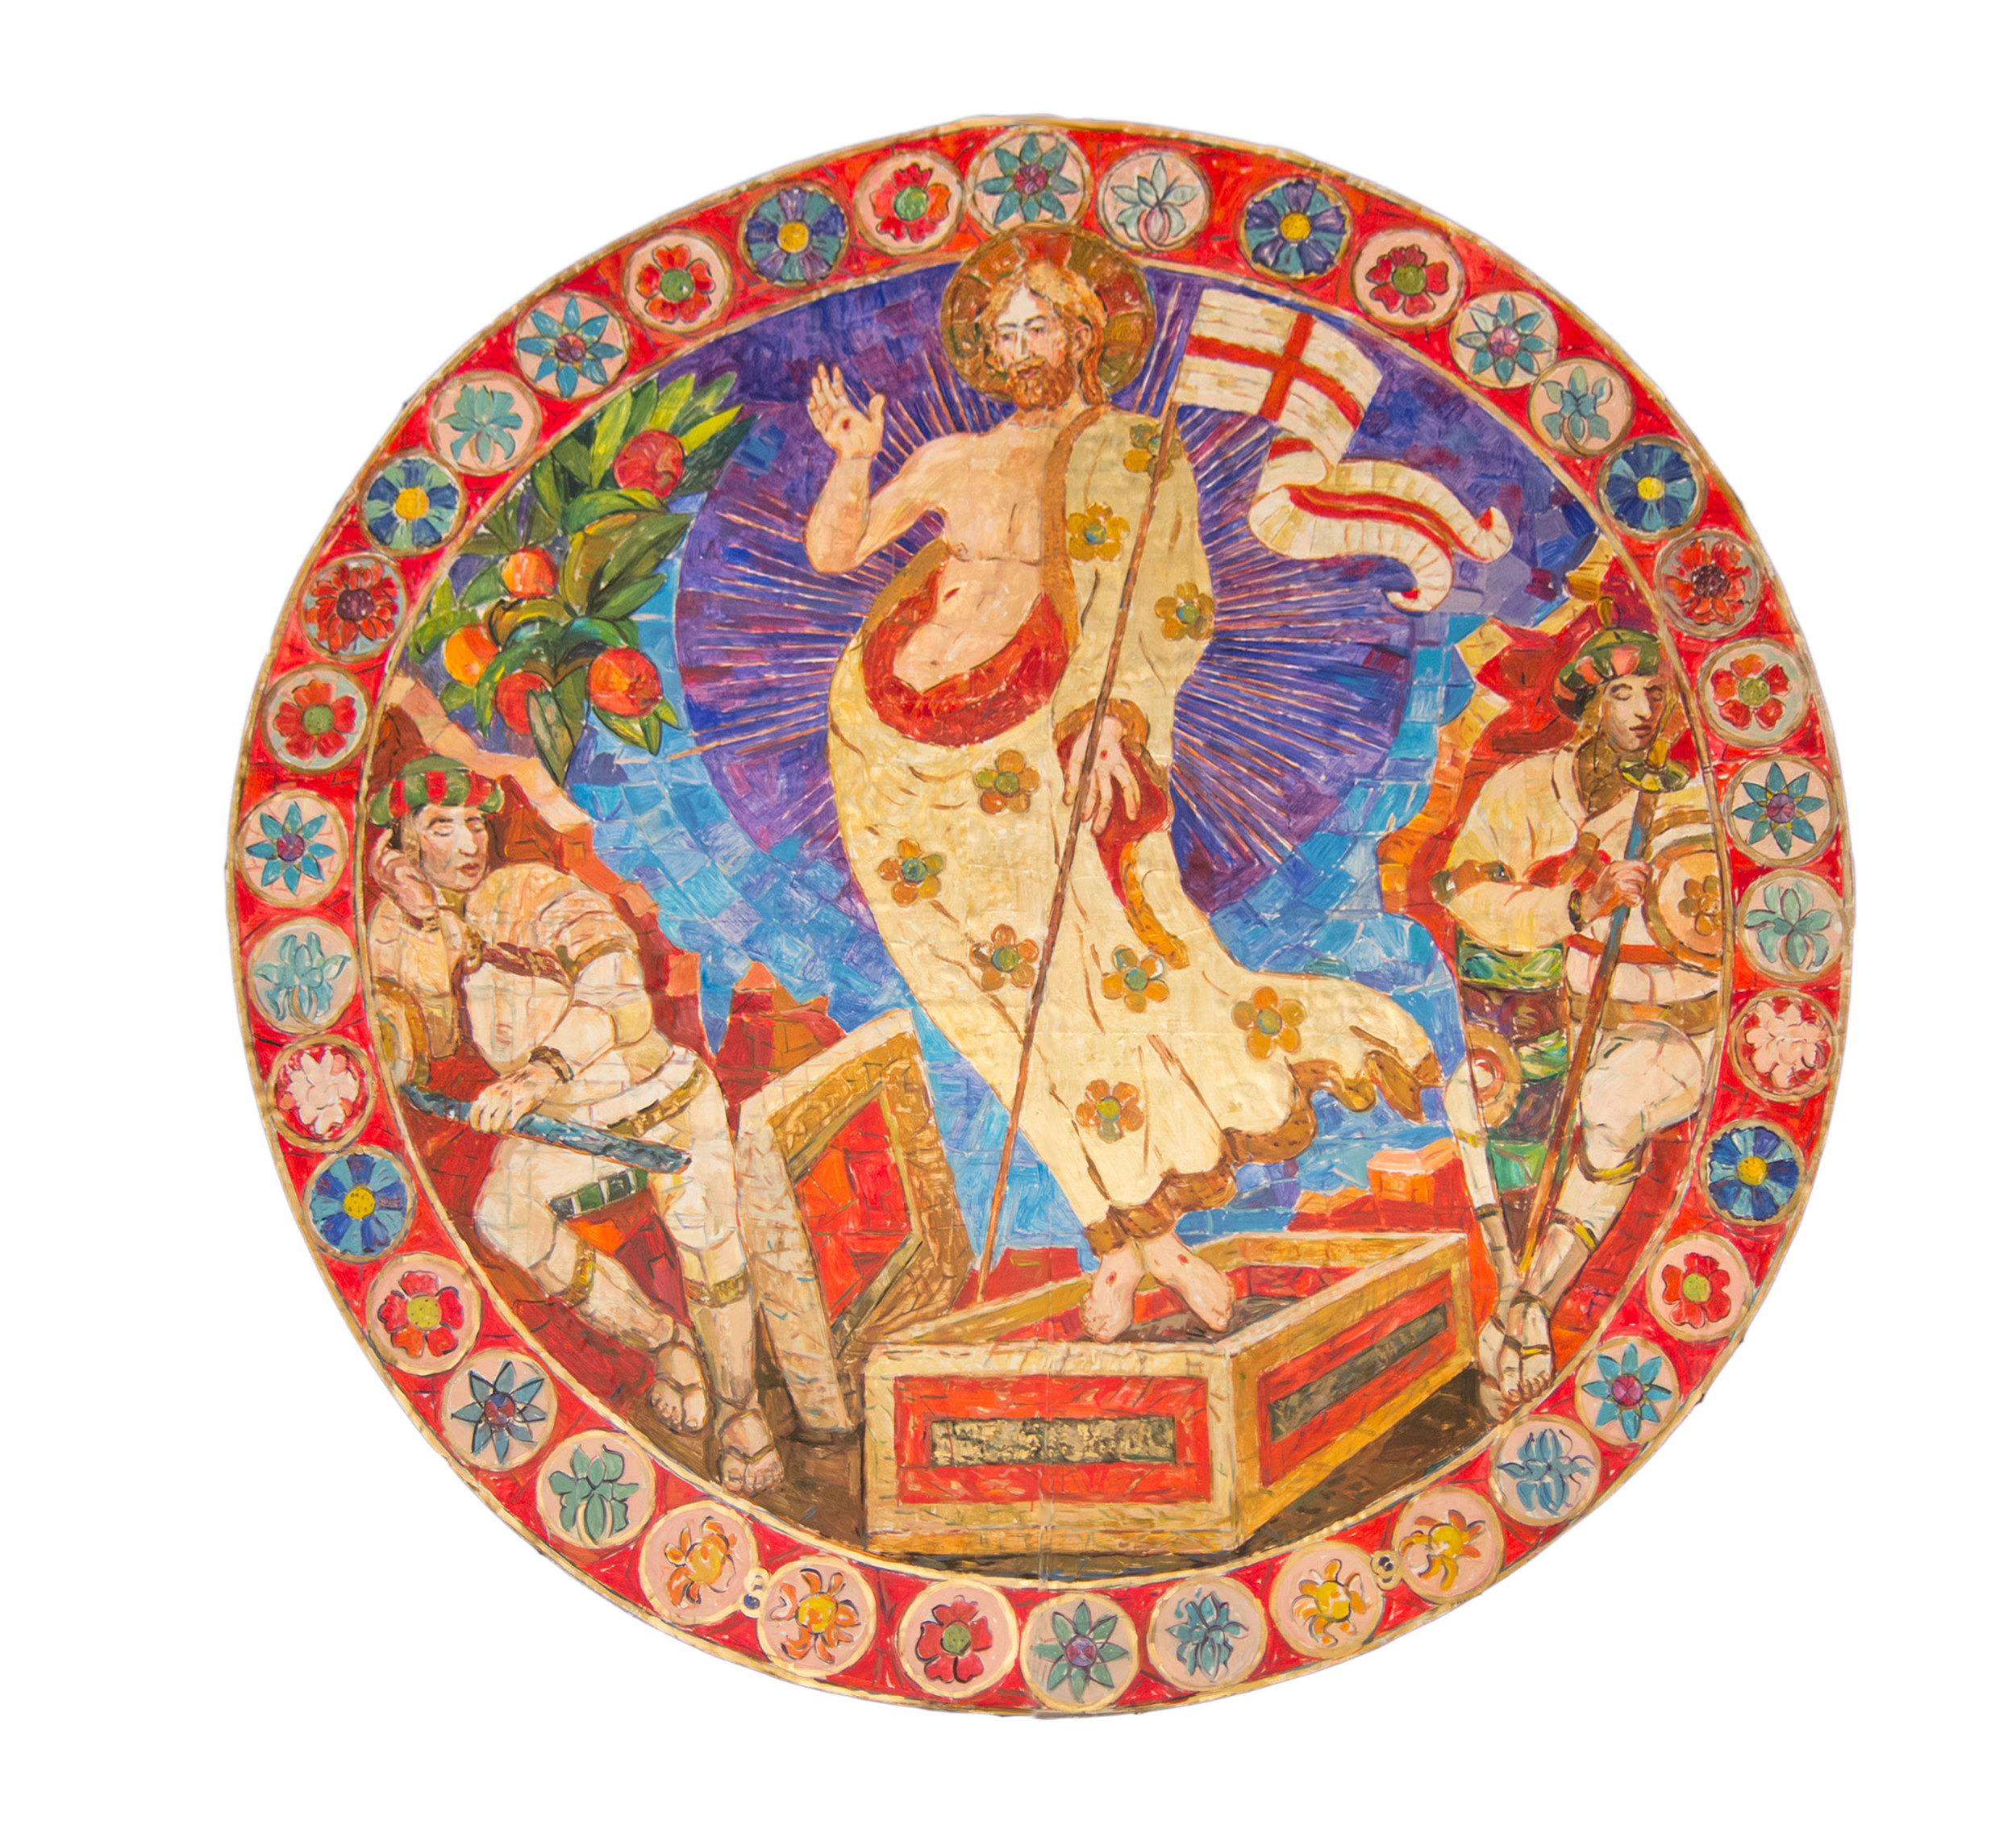 University Church artwork depicting the resurrection by Martha Mason